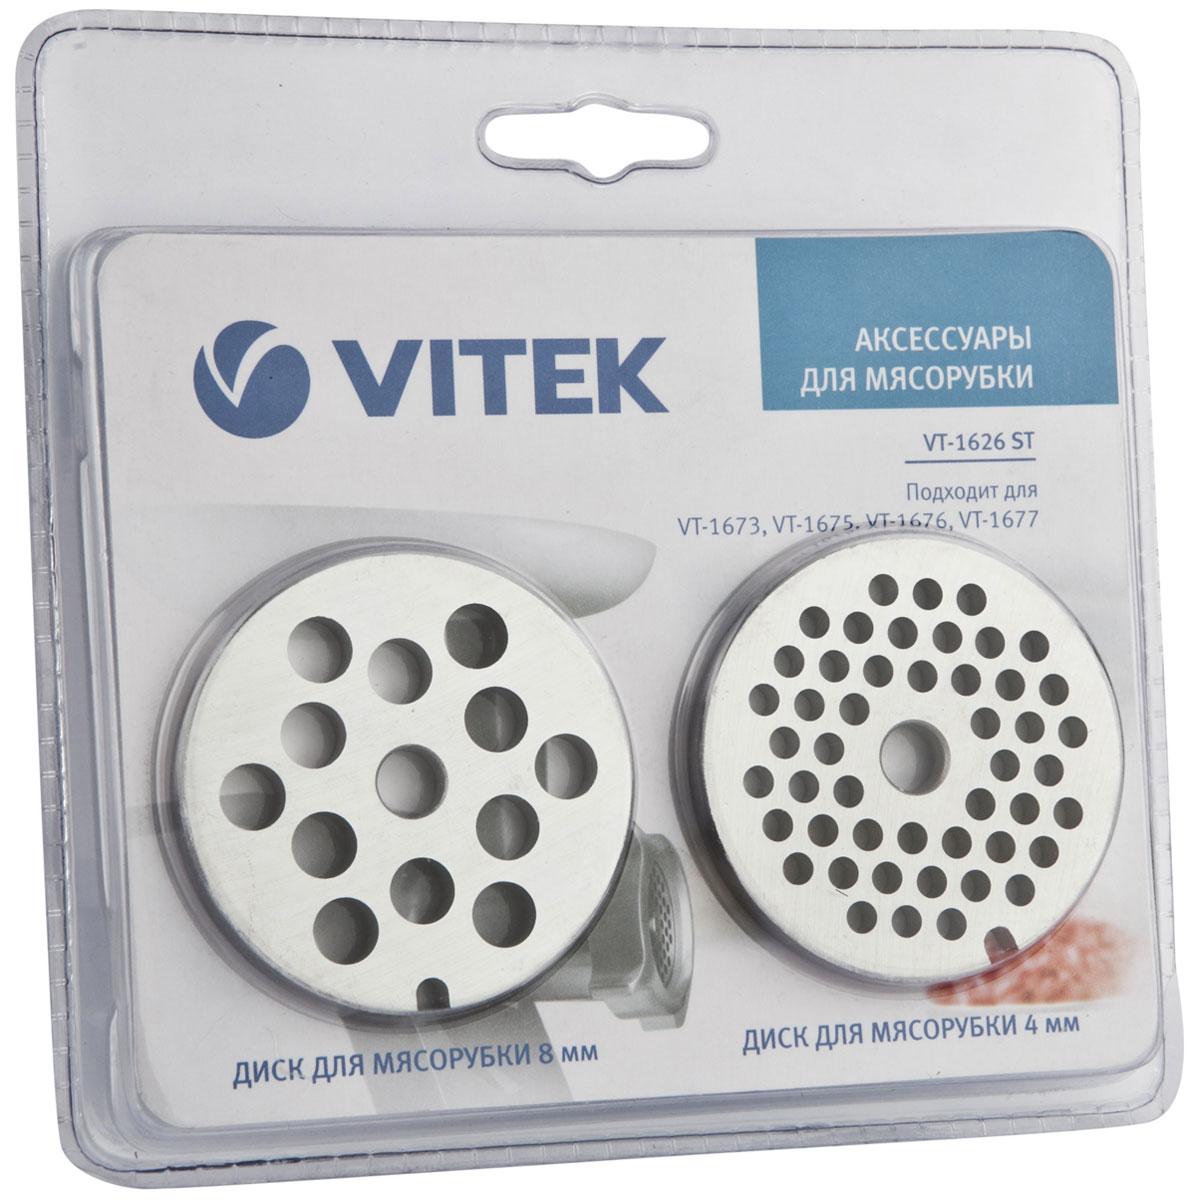 Vitek VT-1626 ST насадки для мясорубки (решетки)